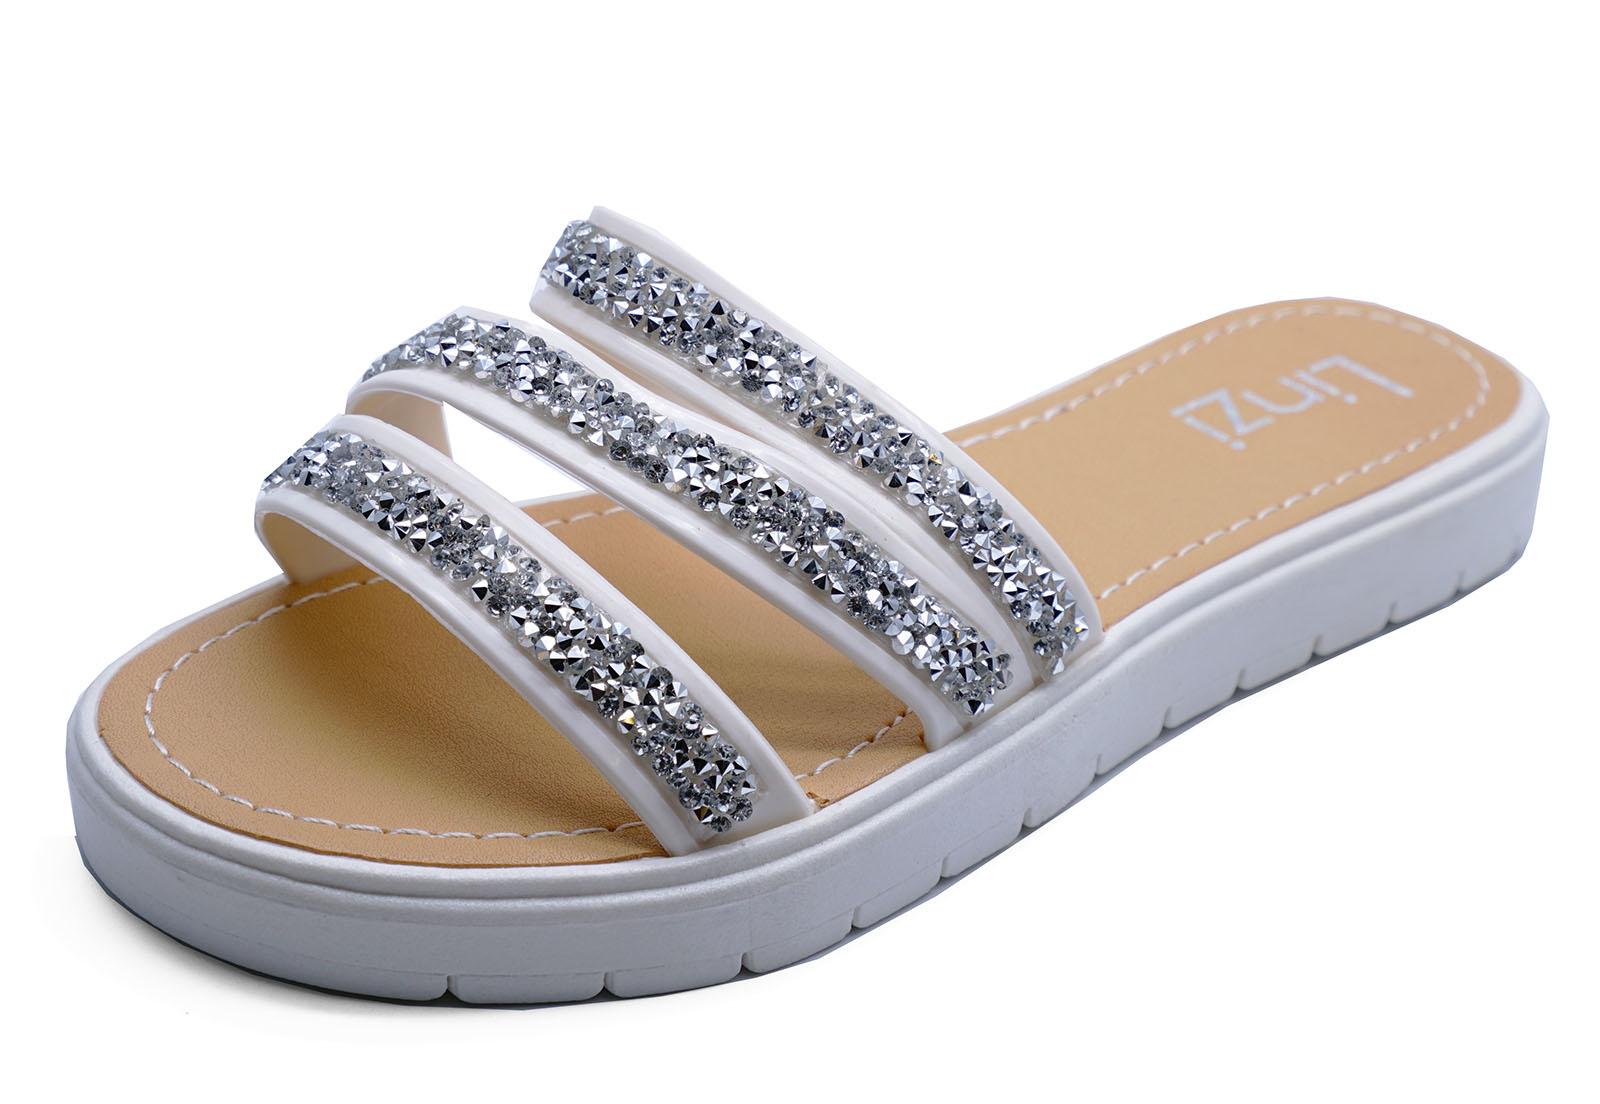 Mujer Blanco Chanclas Diamante Sandalias SLIDER Zapato plano Vacaciones